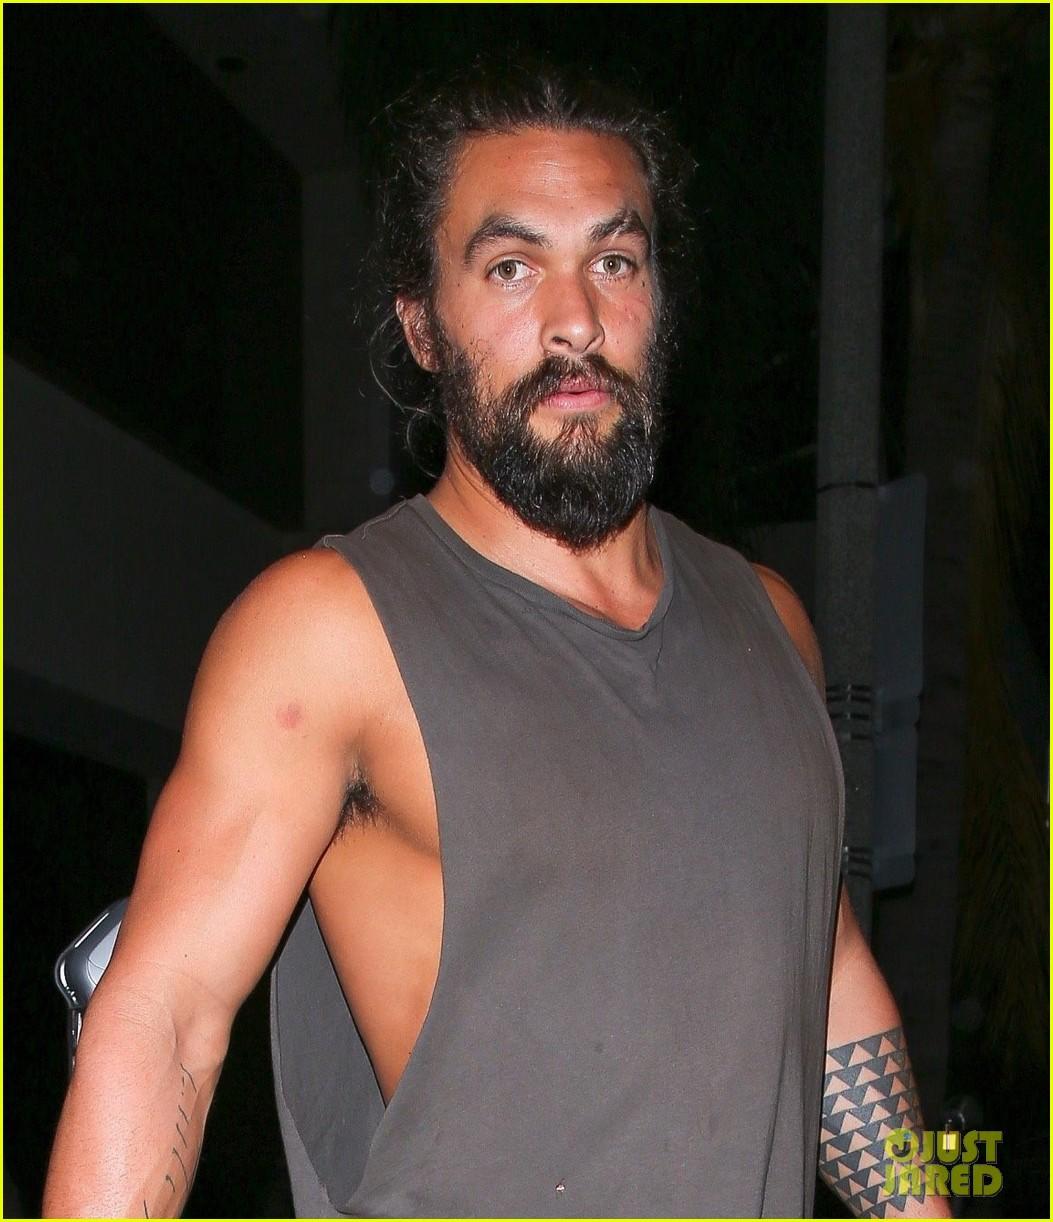 Jason Momoa Cheated: Jason Momoa Muscles Up At Dinner, Bares His Biceps: Photo